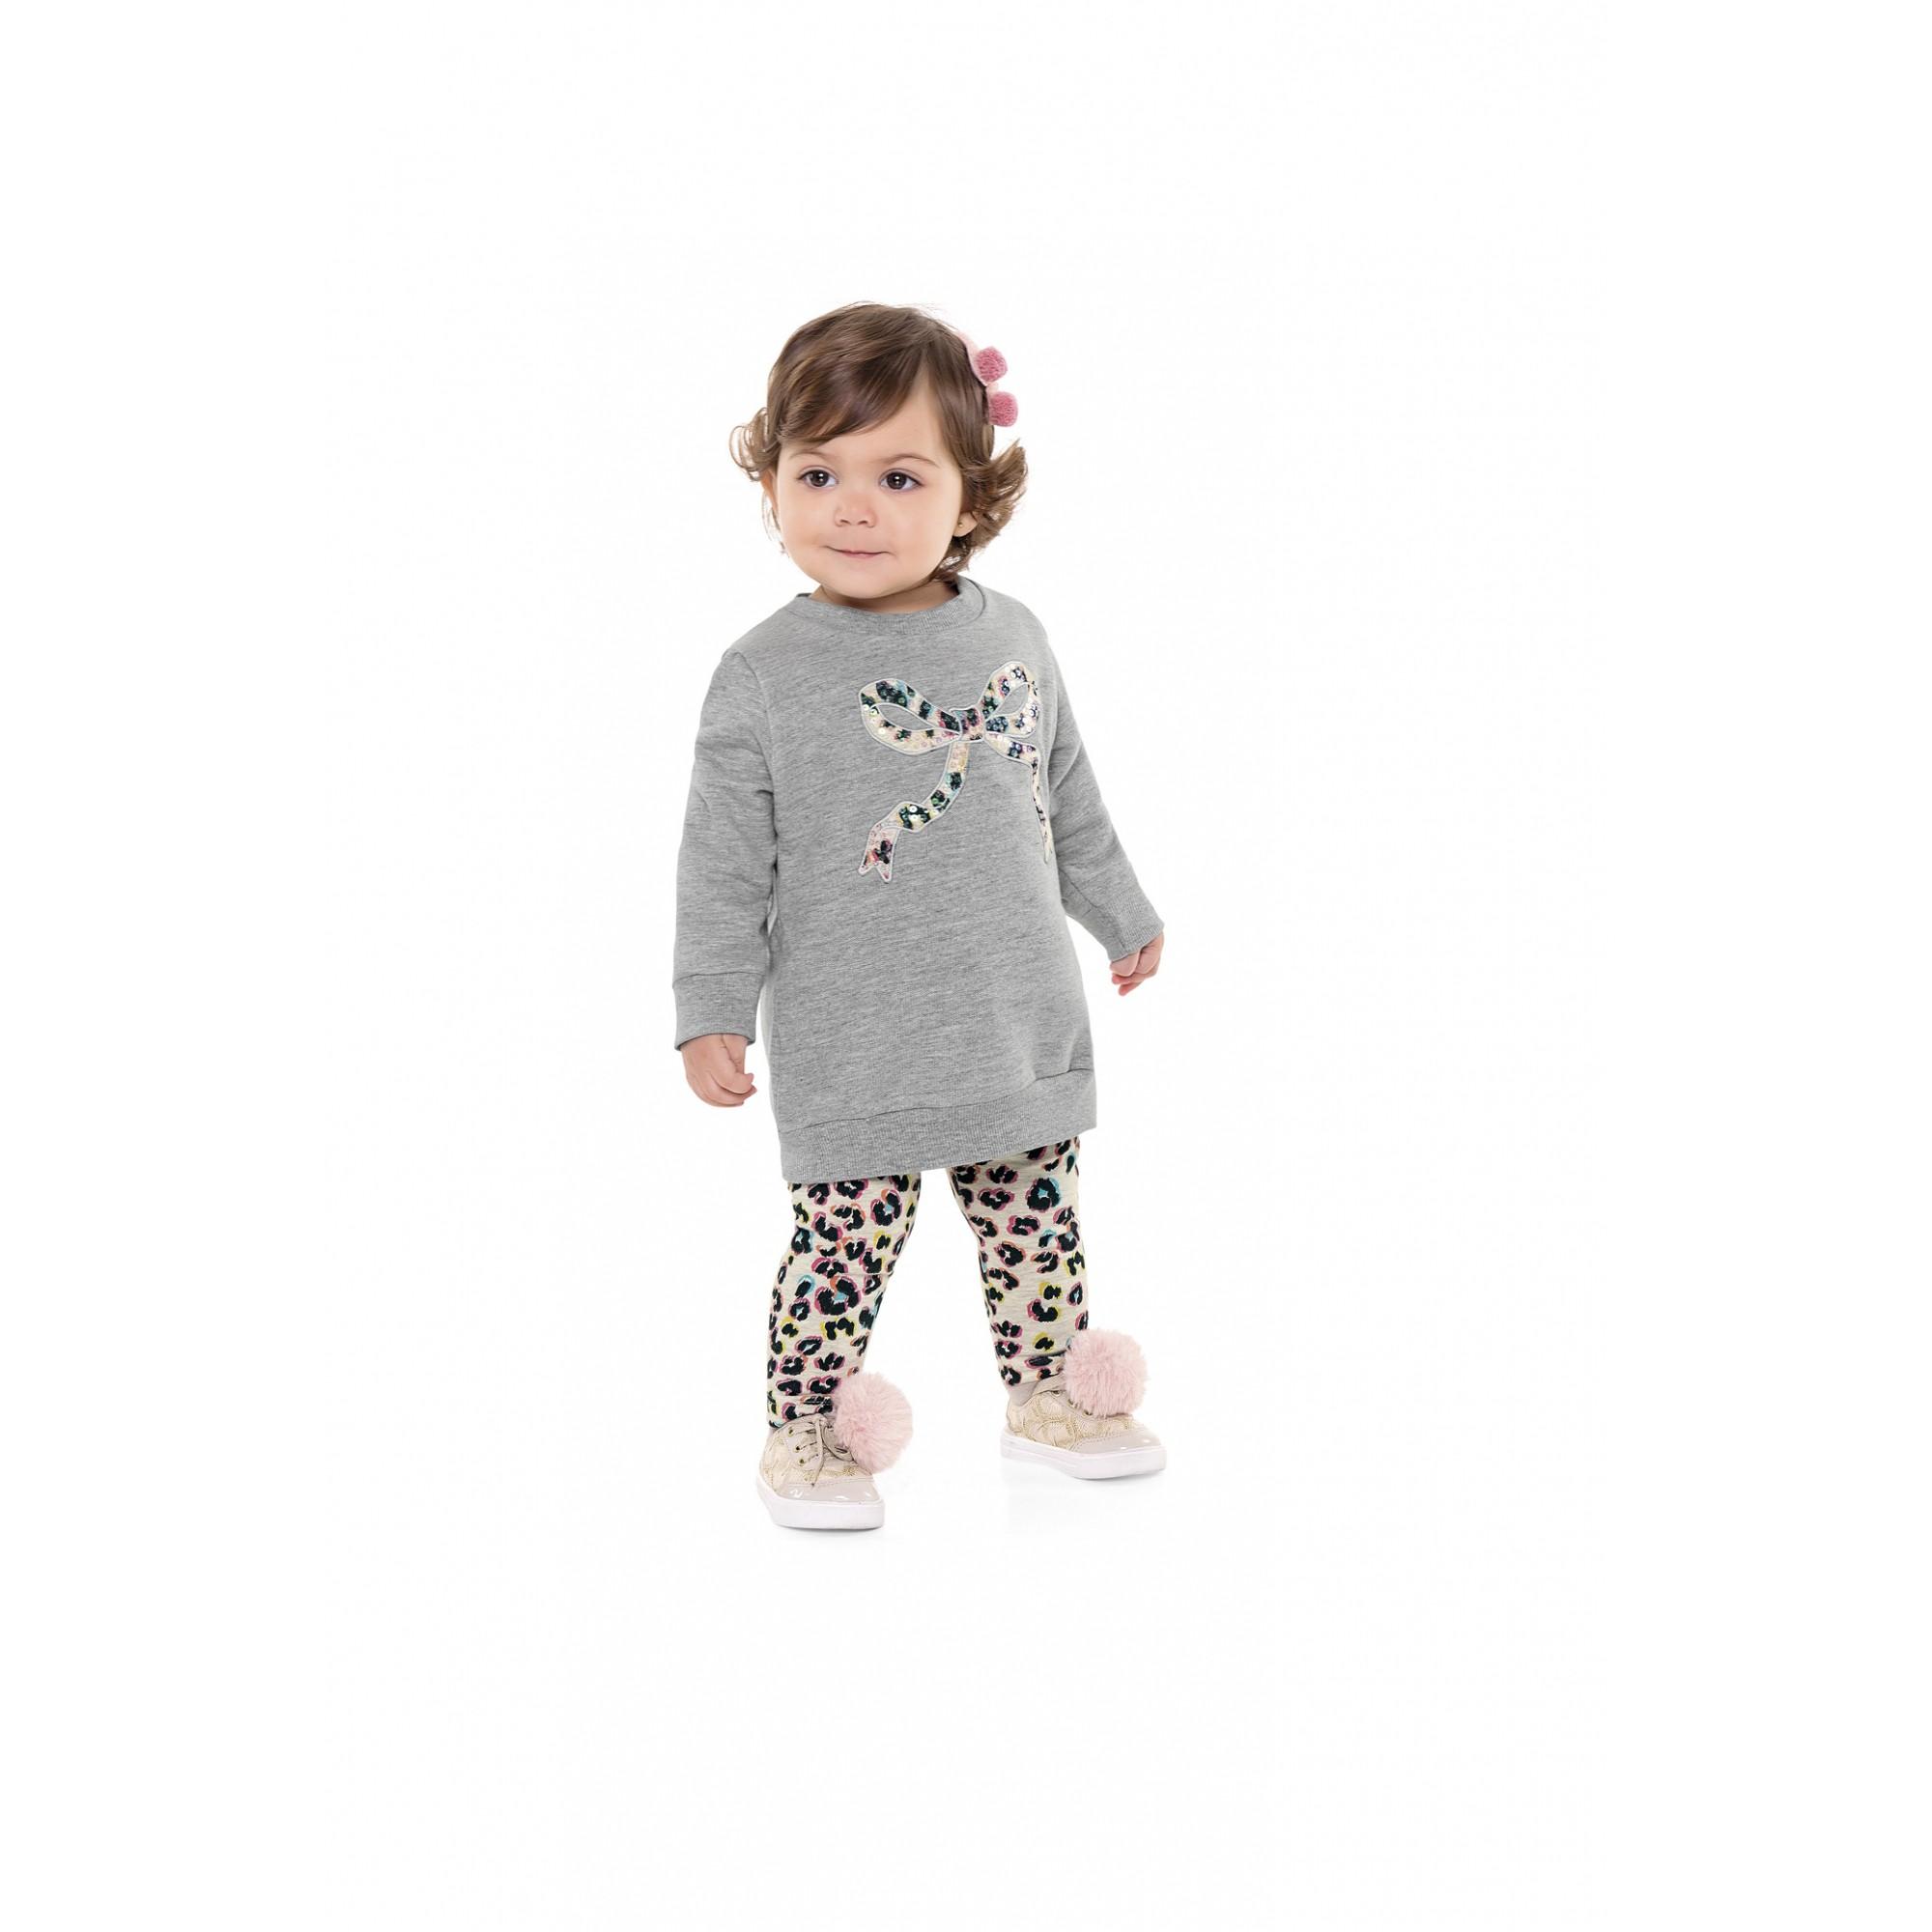 Conjunto infantil feminino para bebê Casaco e Calça Legging Animal Print - Fakini